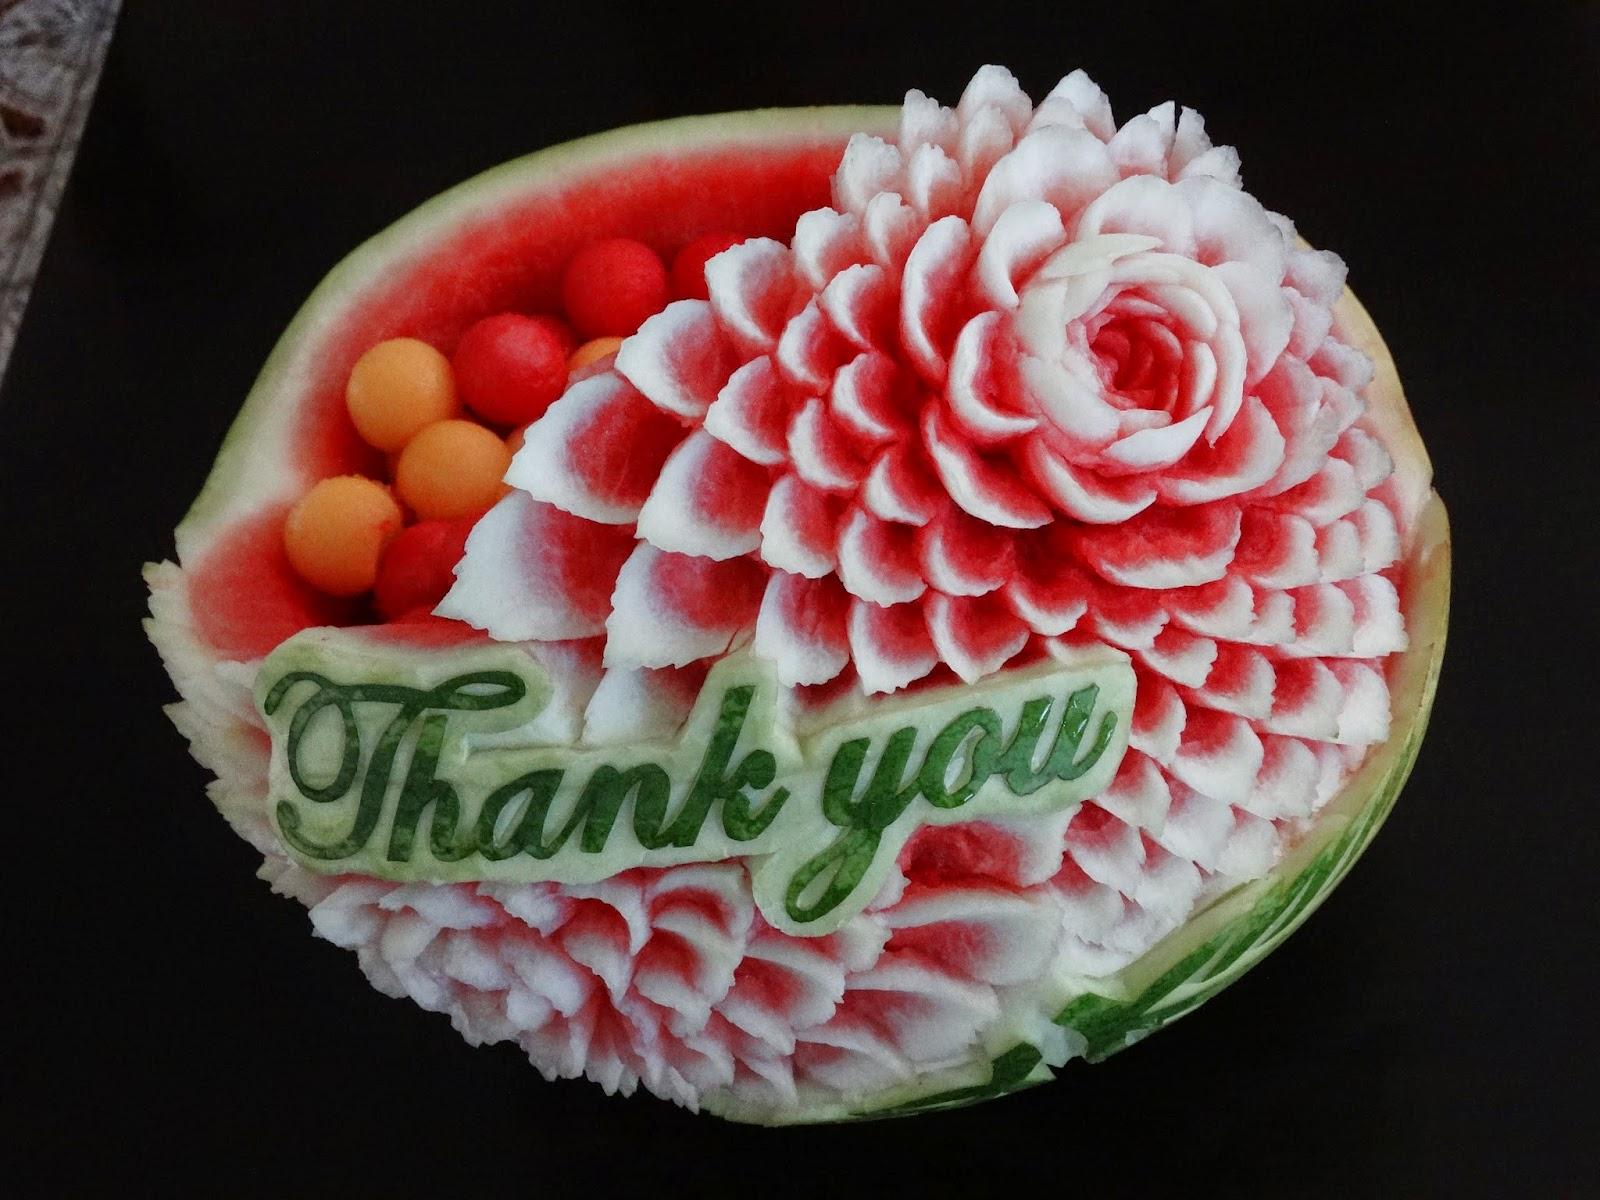 Fruit art arrangements thank you carving